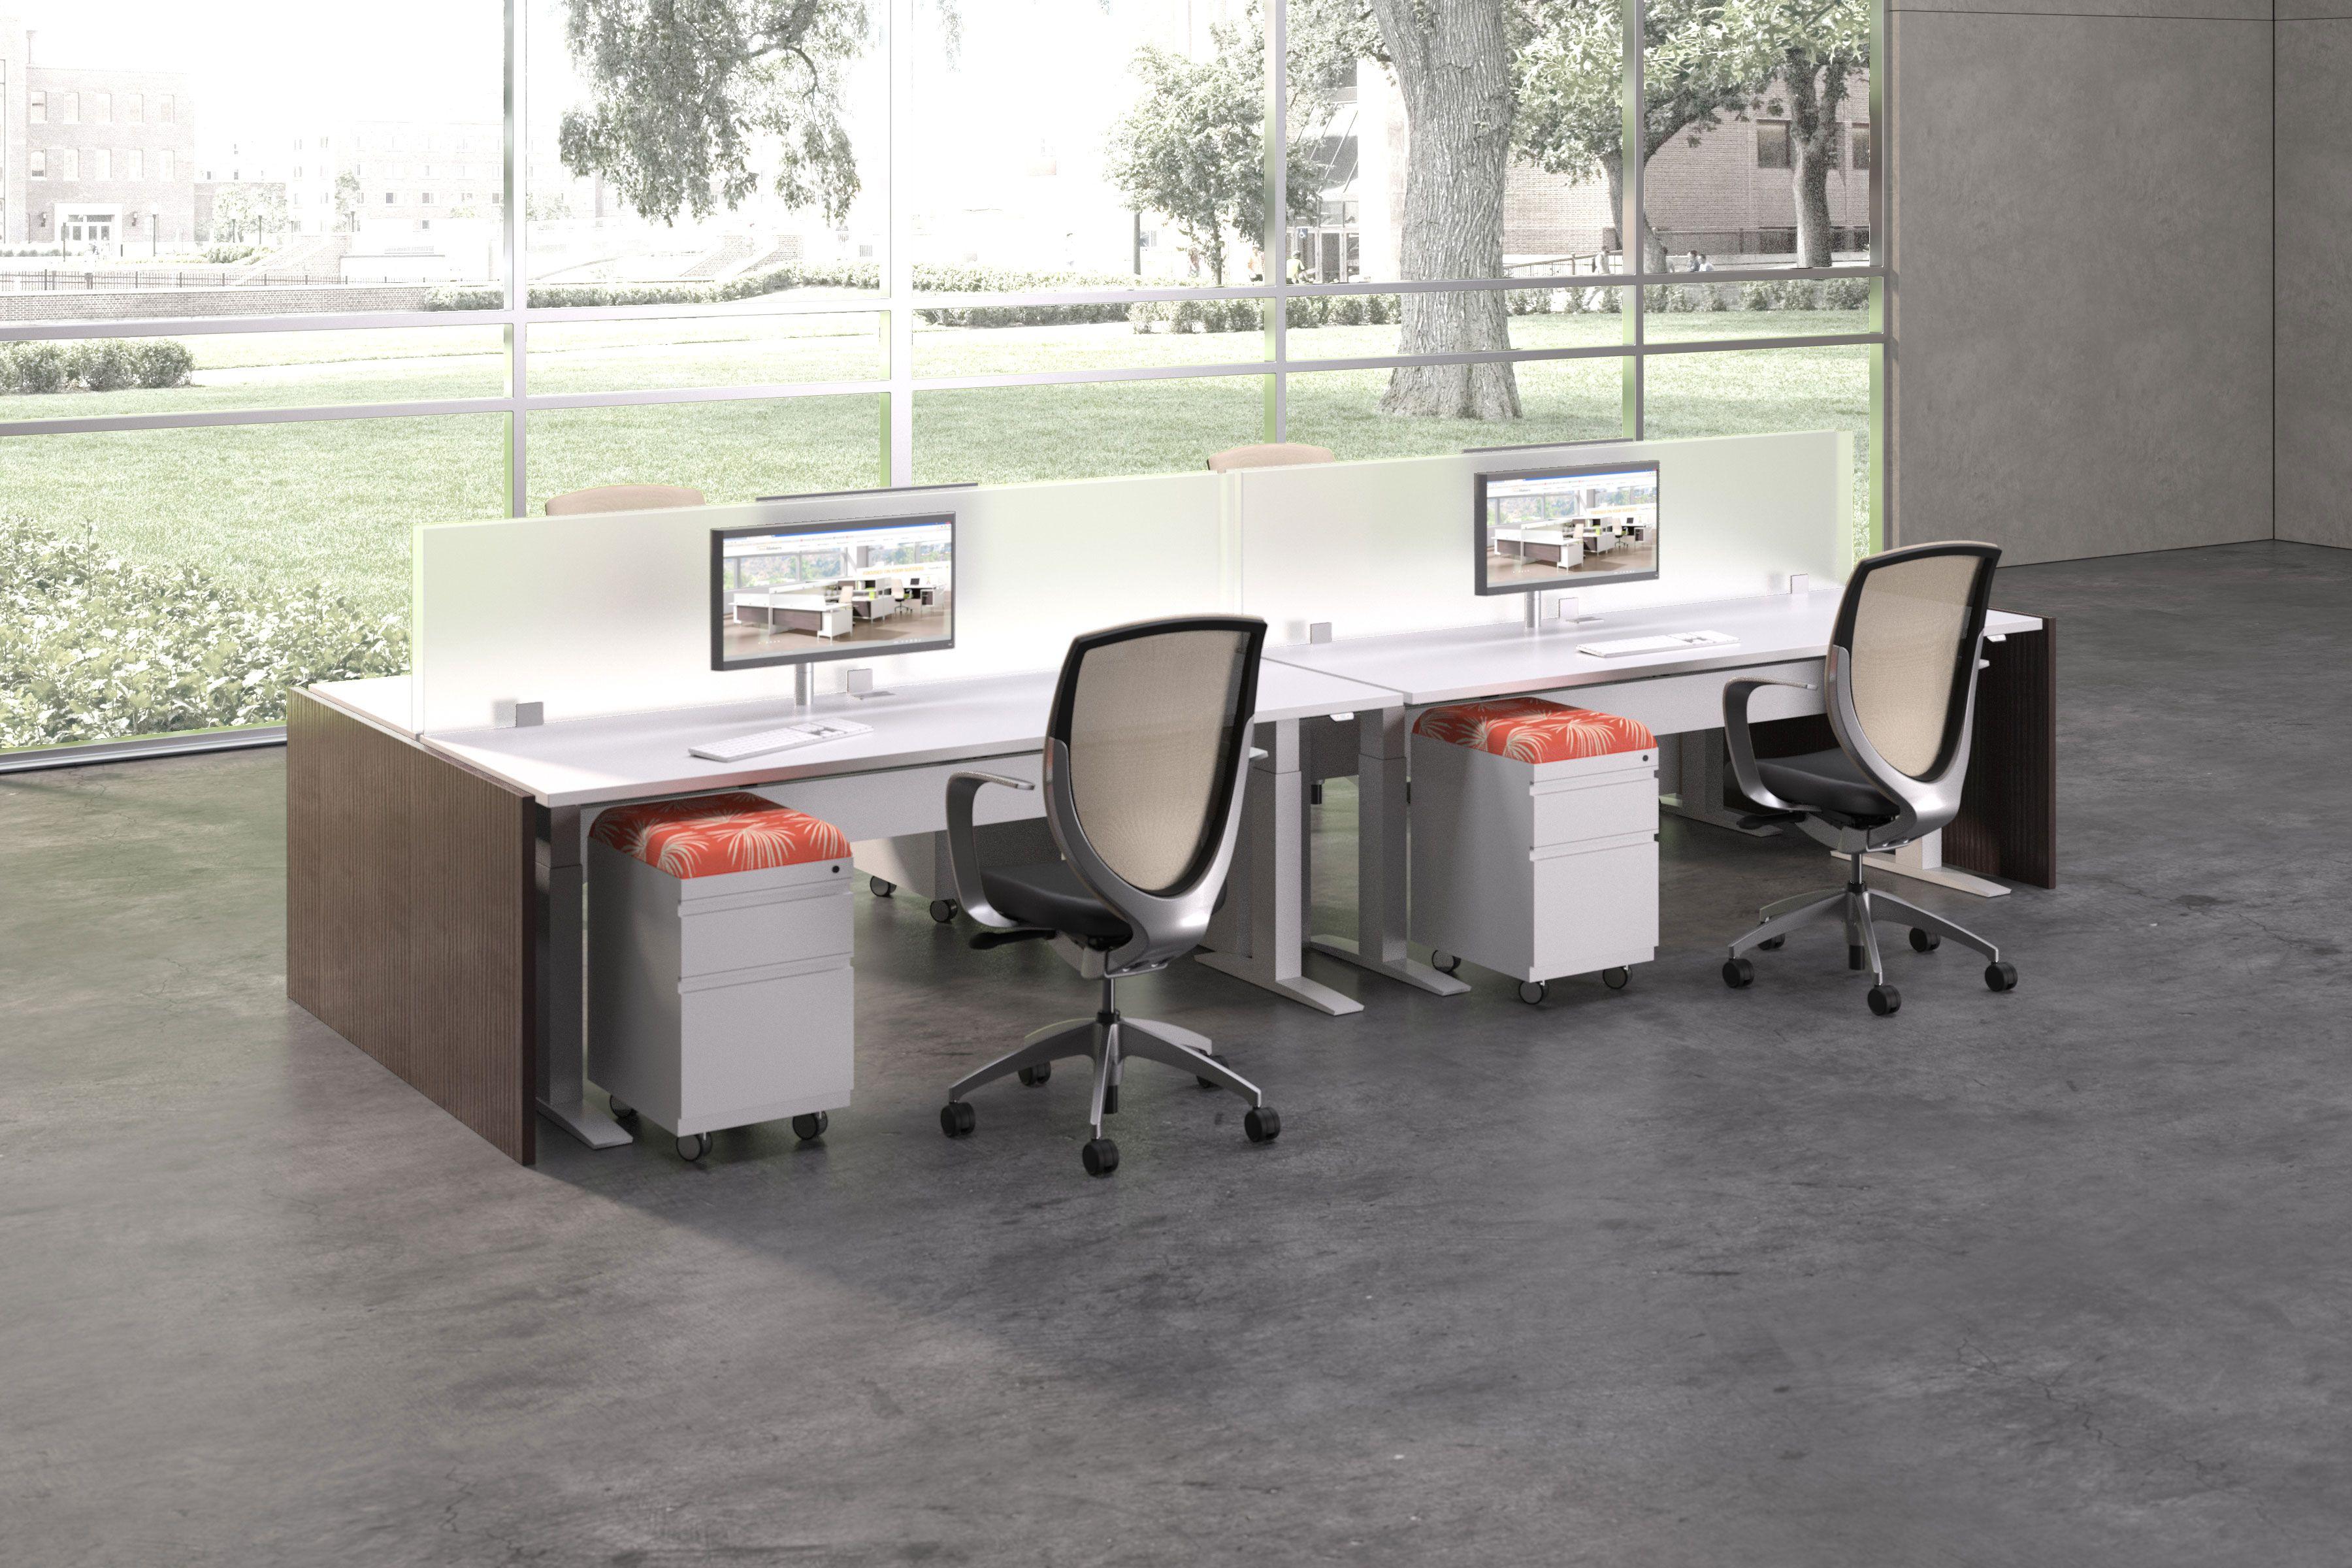 Brilliant Deskmakers Hover Industrial Office Building Desk Download Free Architecture Designs Scobabritishbridgeorg